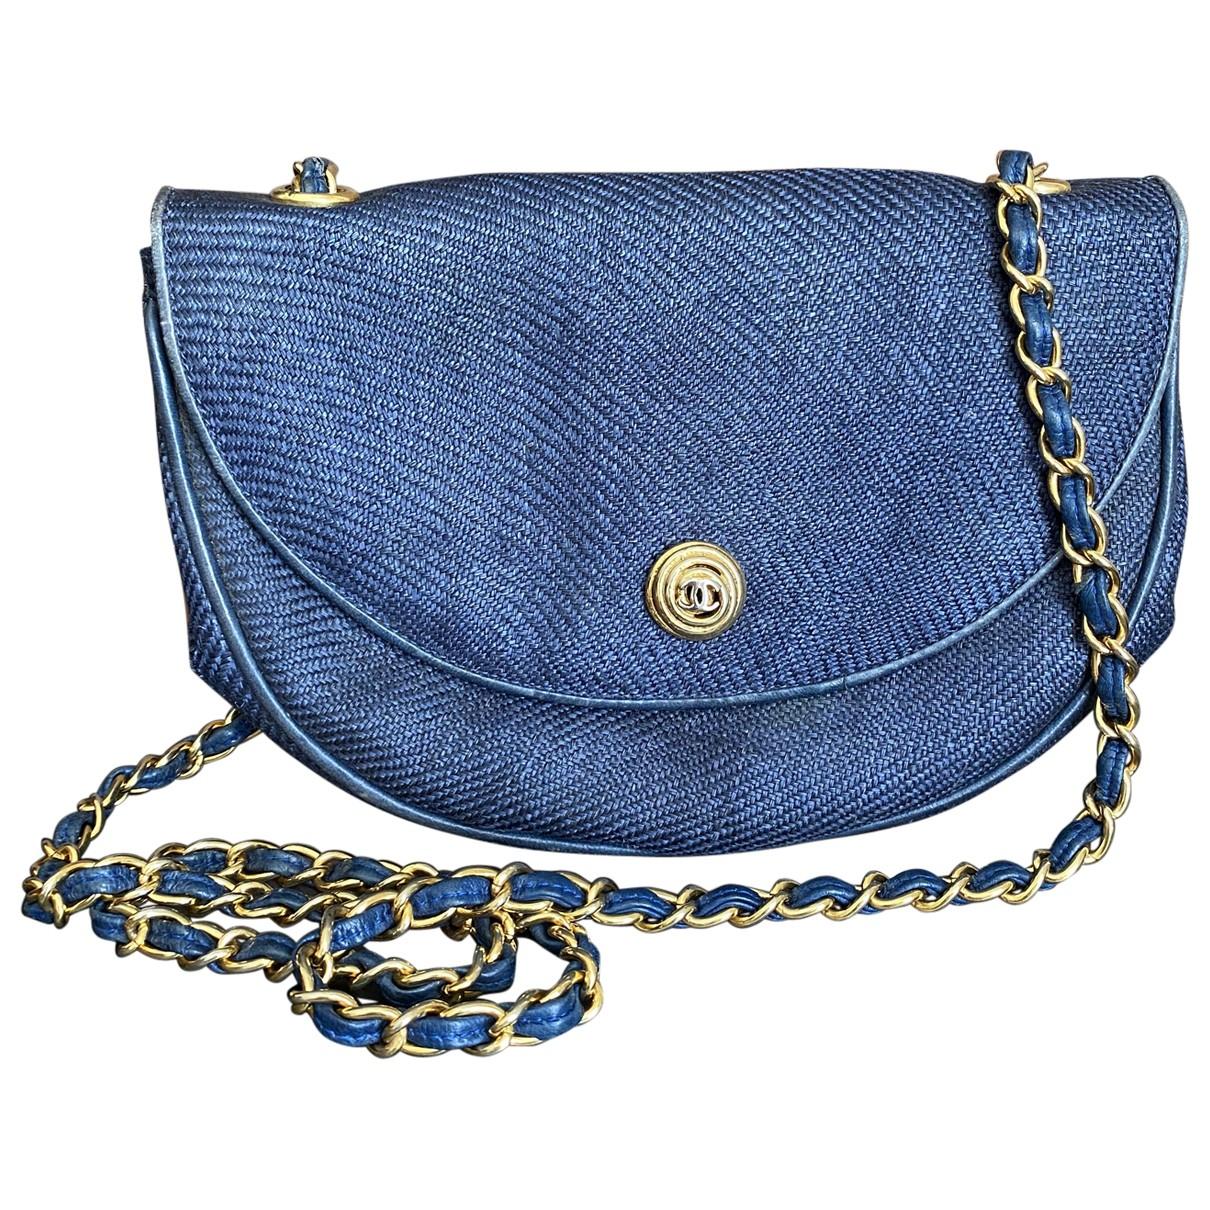 Chanel \N Navy Cloth handbag for Women \N